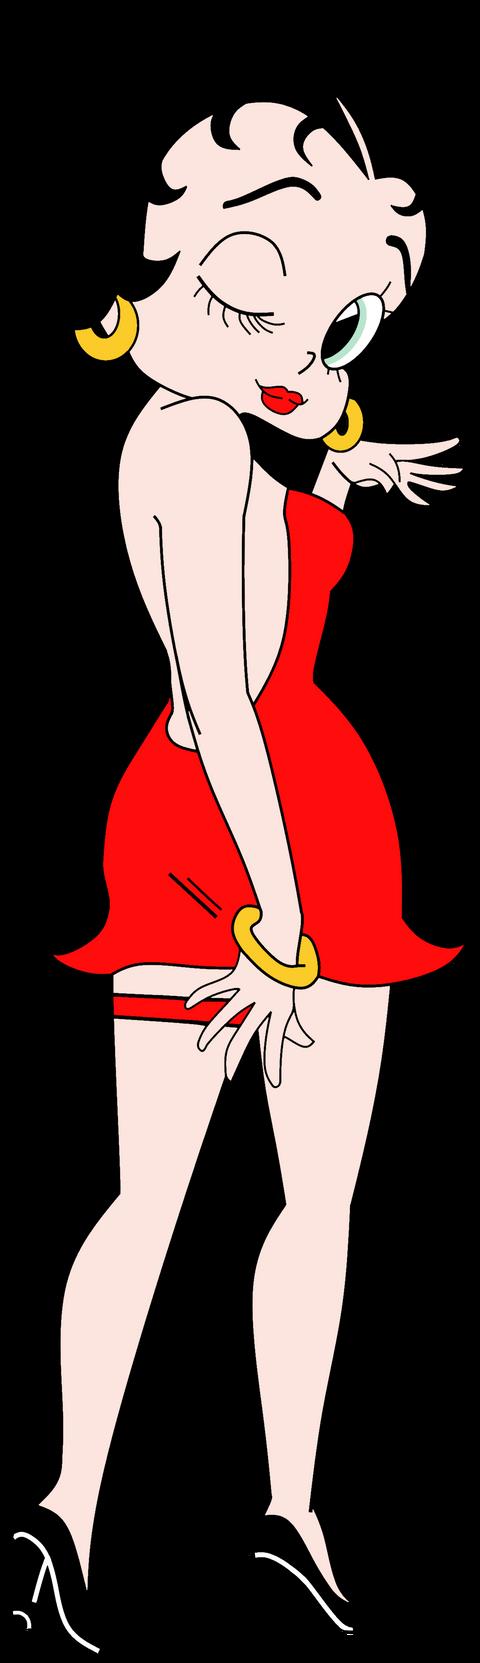 Betty Boop Anime Render by Rapper1996